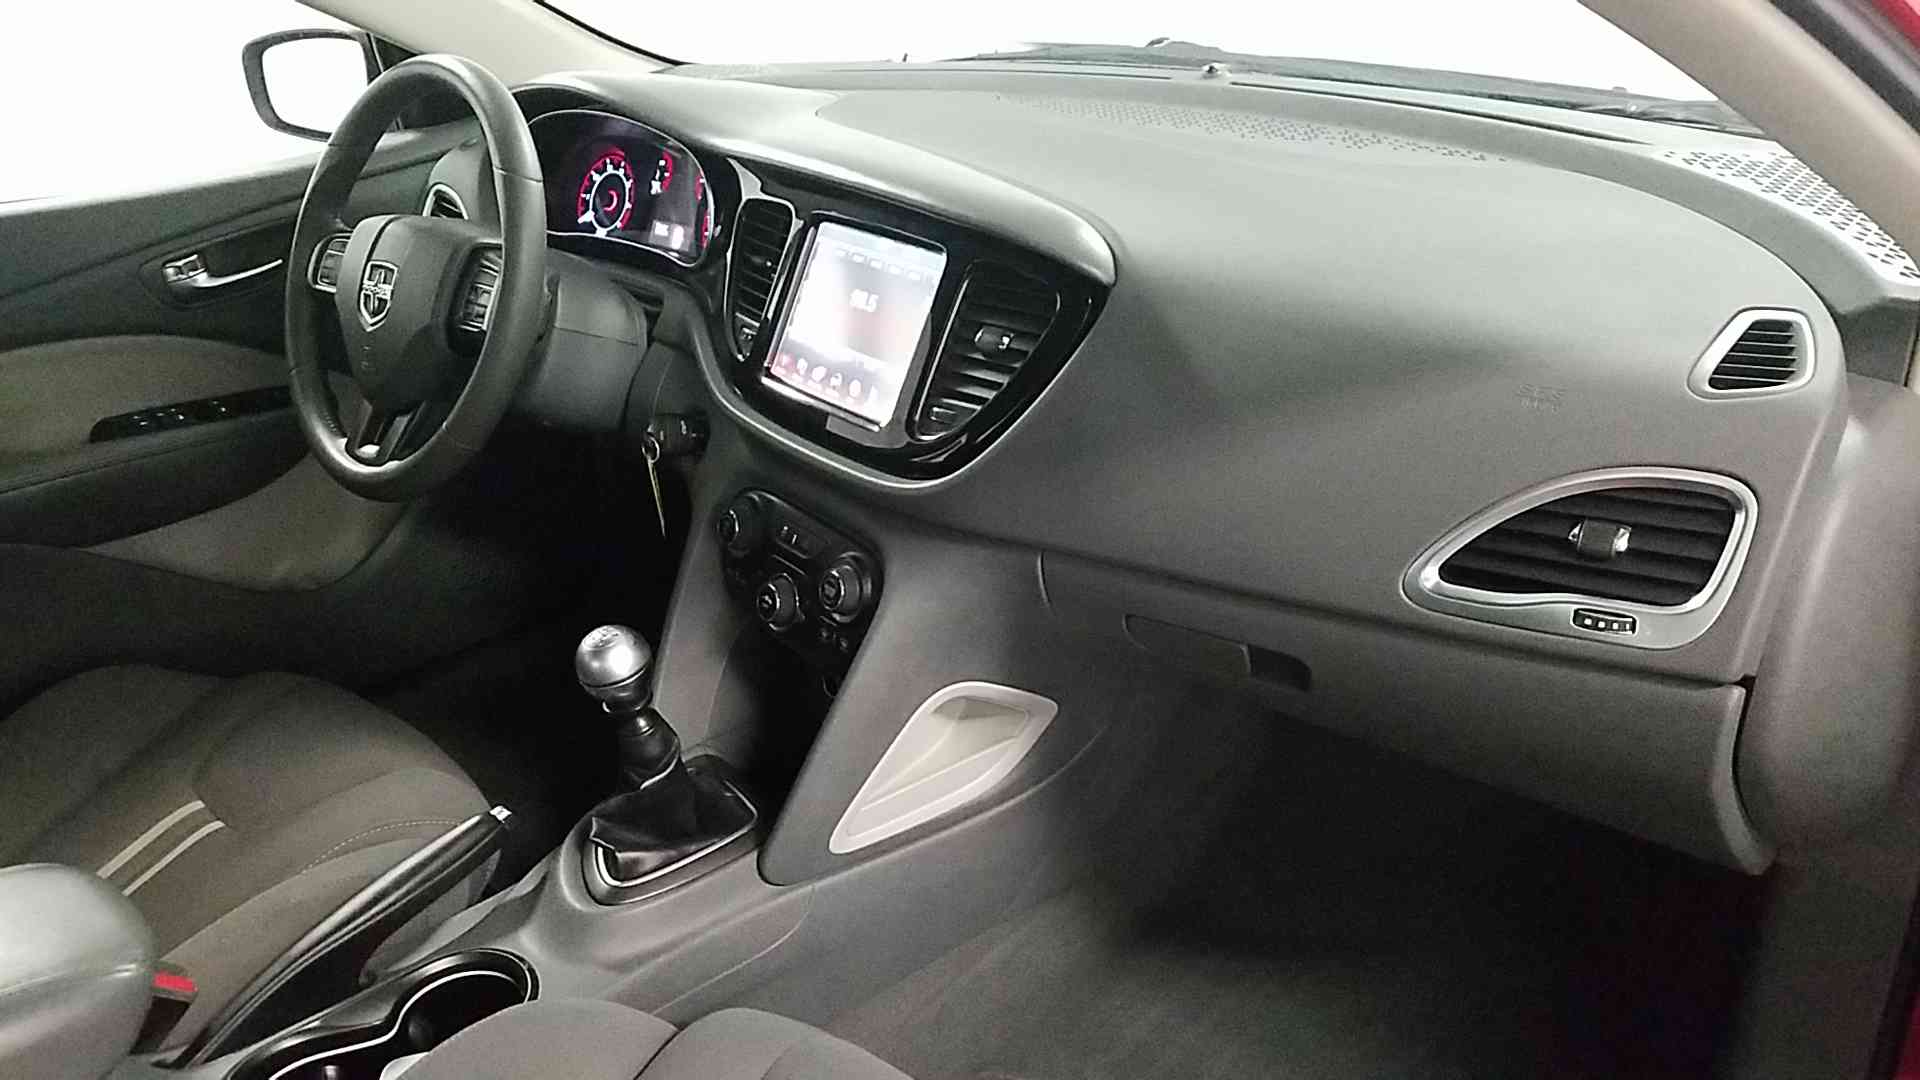 2013 Dodge Dart SXT/Rallye FWD 4D Sedan